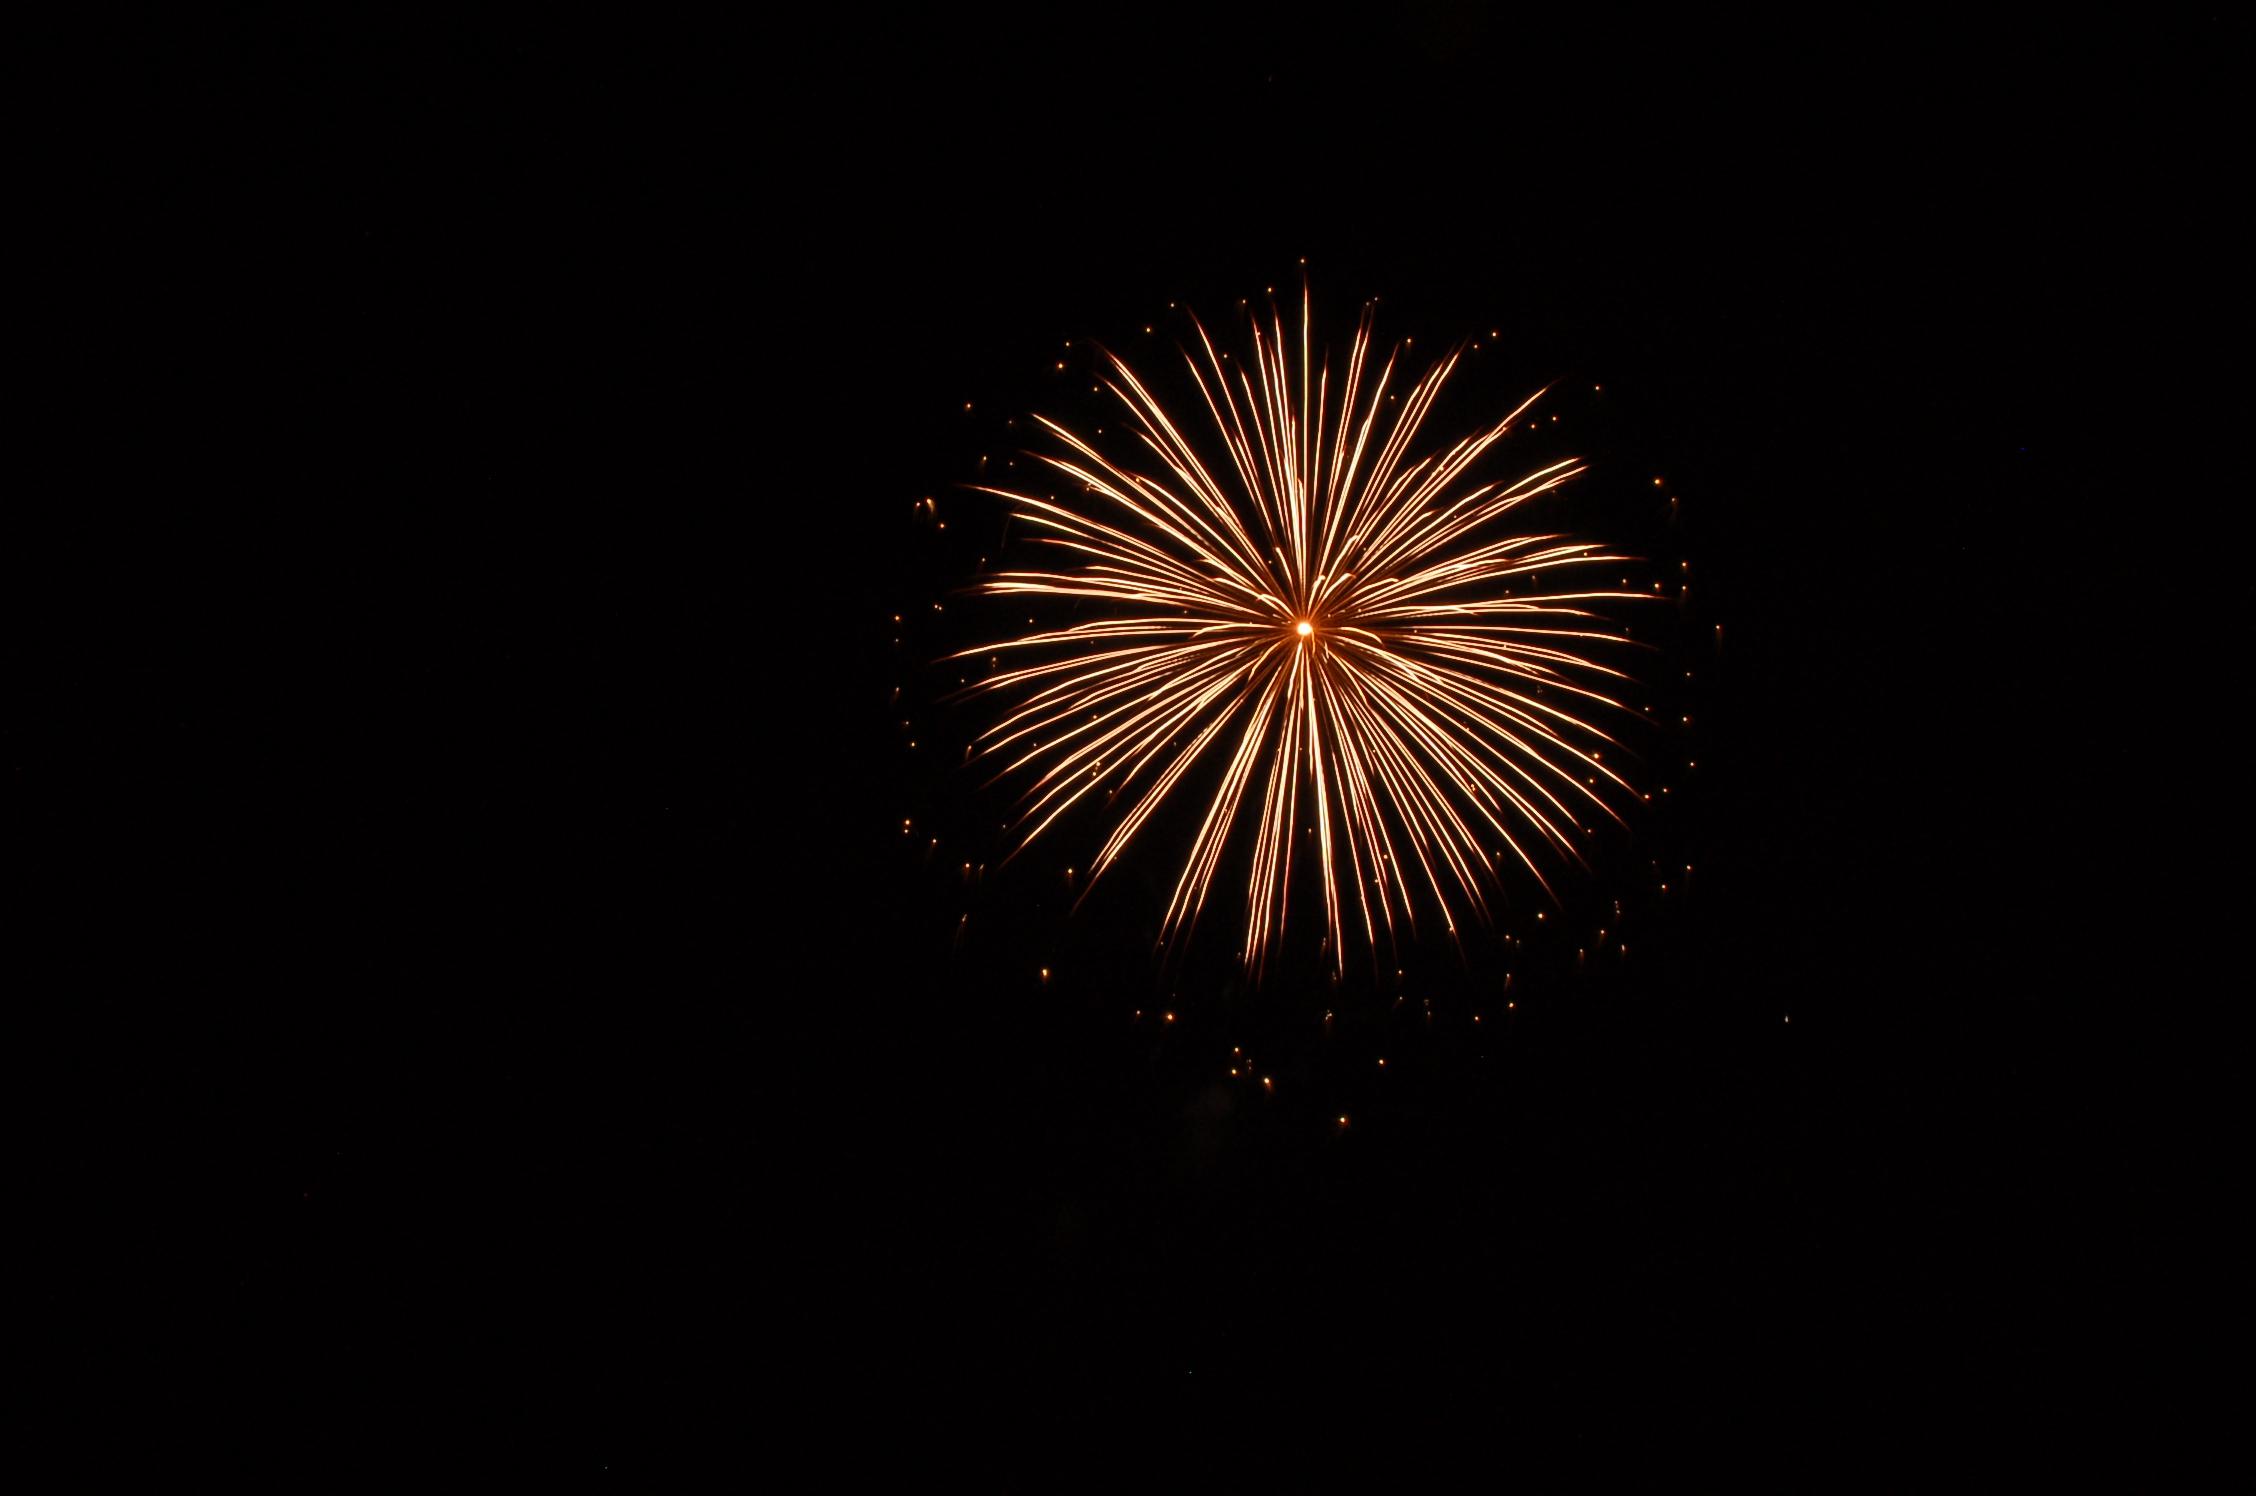 FA_Fireworks_Fireworks034.JPG